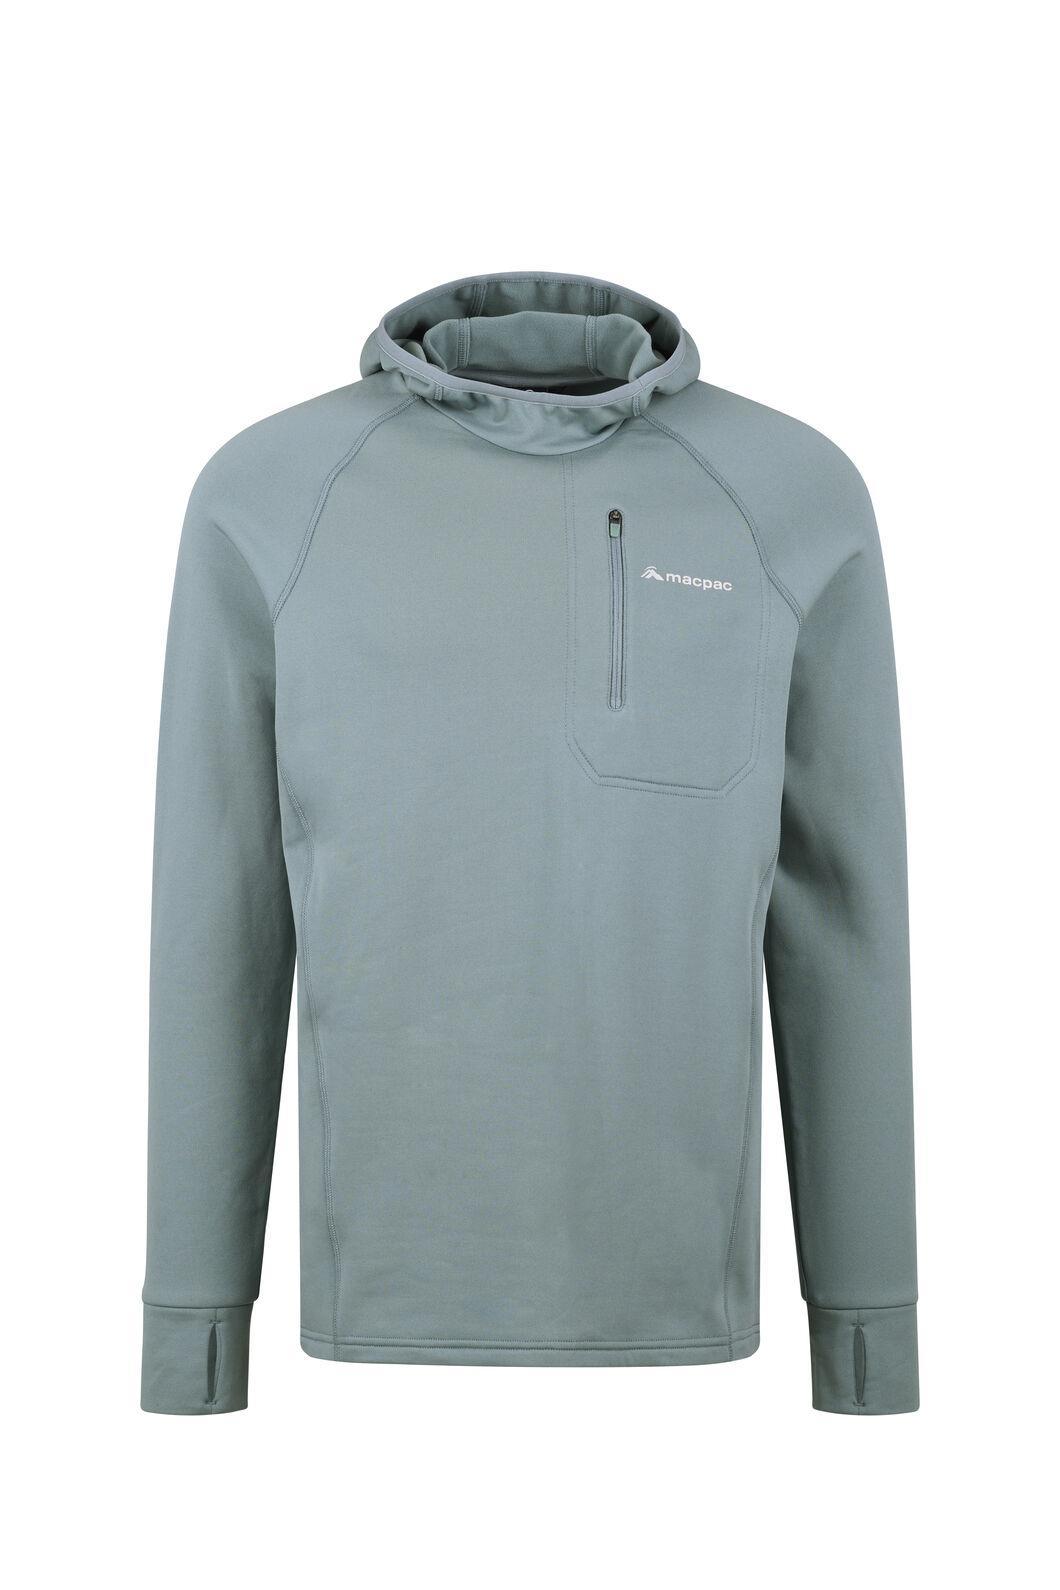 Macpac Traction Pontetorto® Pullover Hoody - Men's, Stormy Sea, hi-res